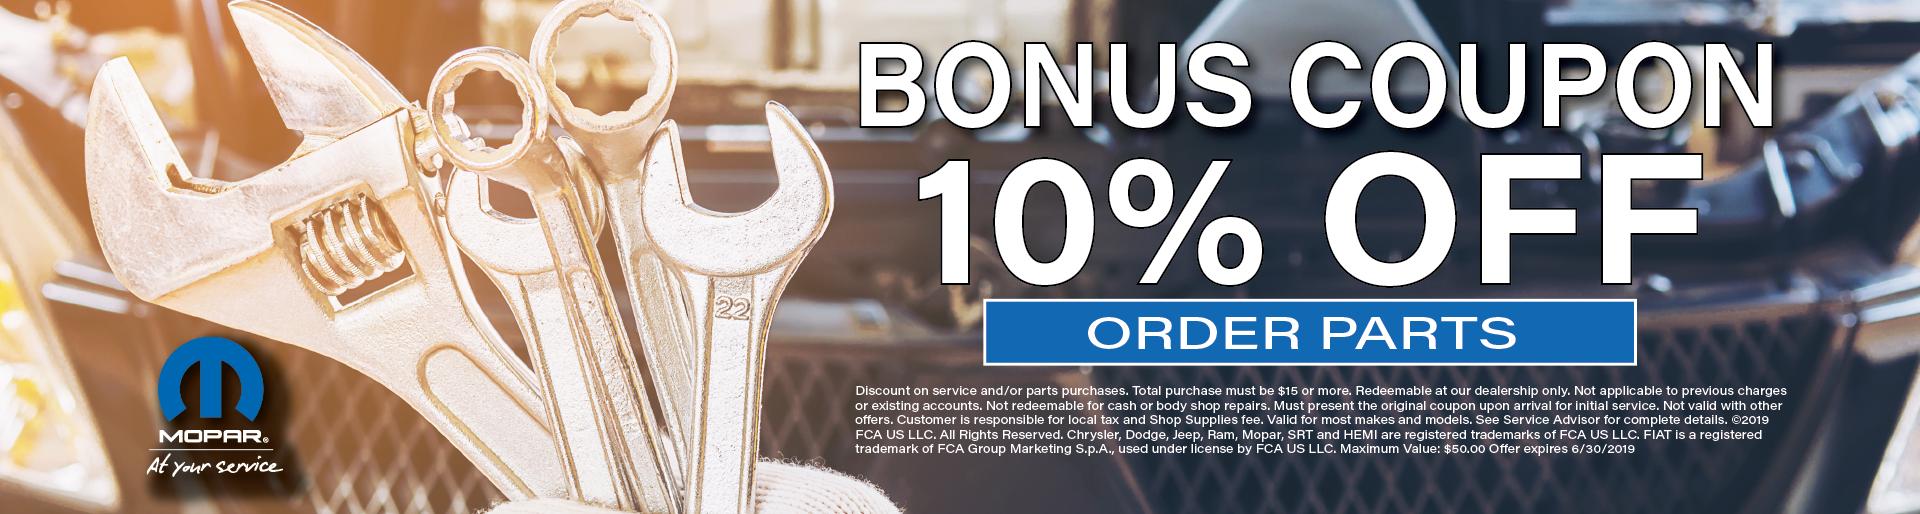 10% Off Bonus Coupon